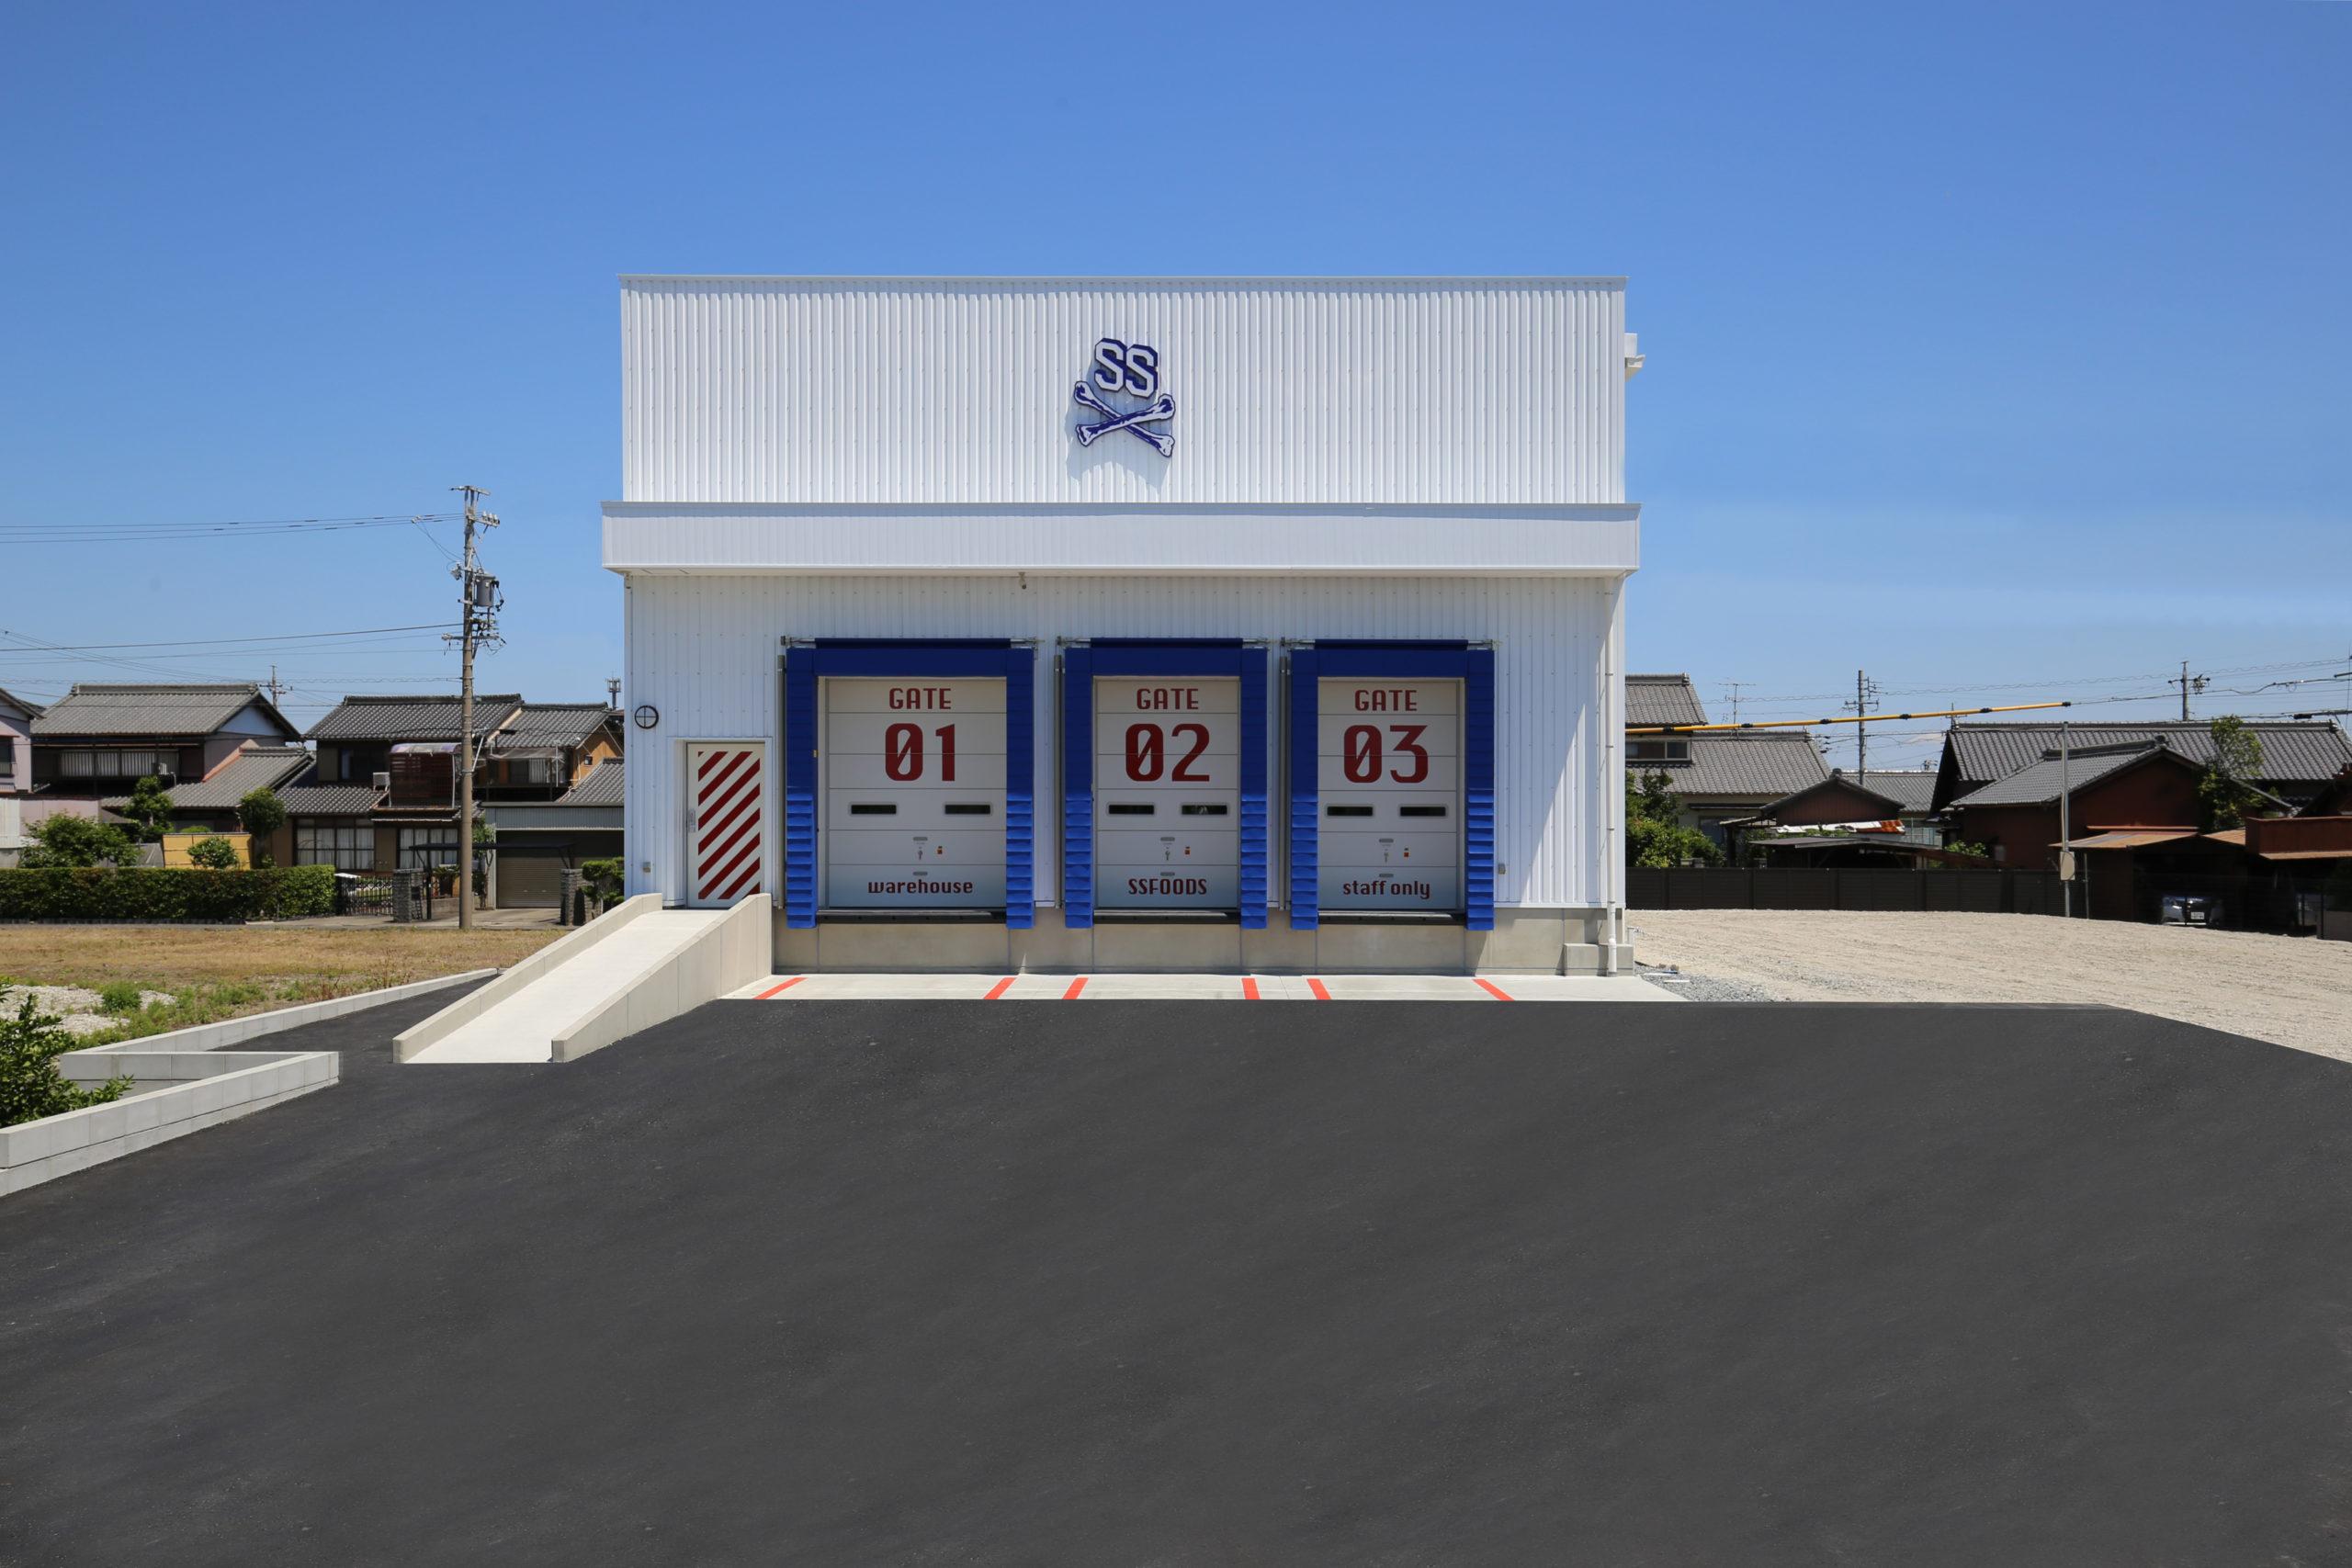 SSフーズ株式会社 あま倉庫